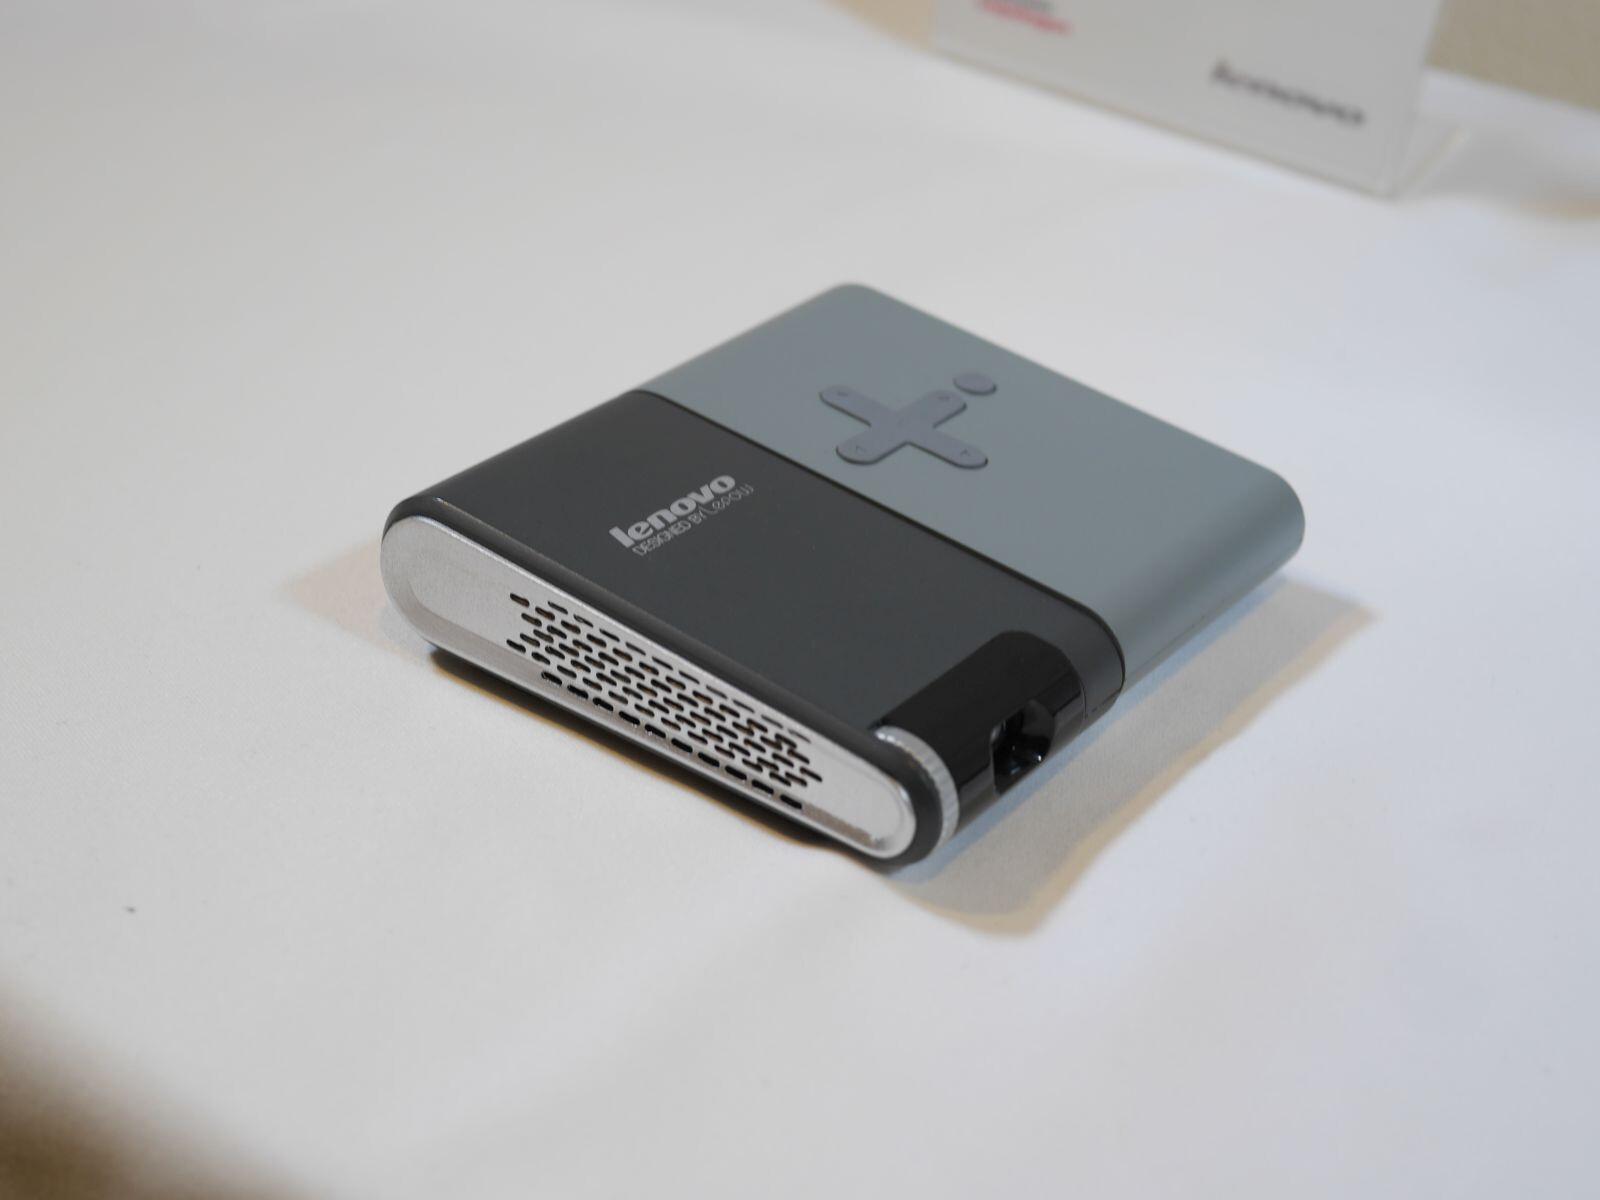 Lenovo pocket projector hands on phonearena reviews for Pocket projector reviews